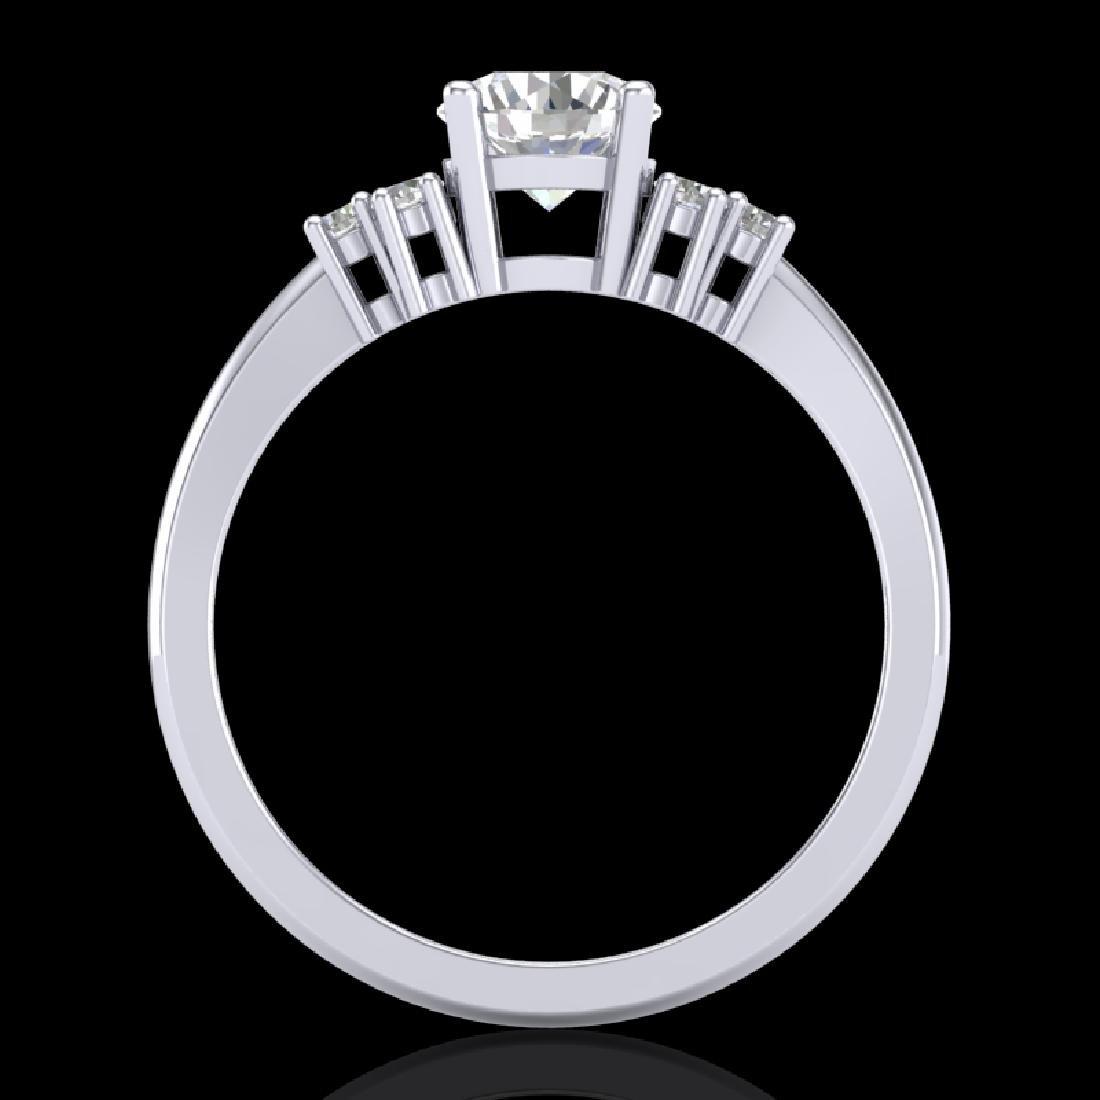 1 CTW VS/SI Diamond Solitaire Ring 18K White Gold - 2